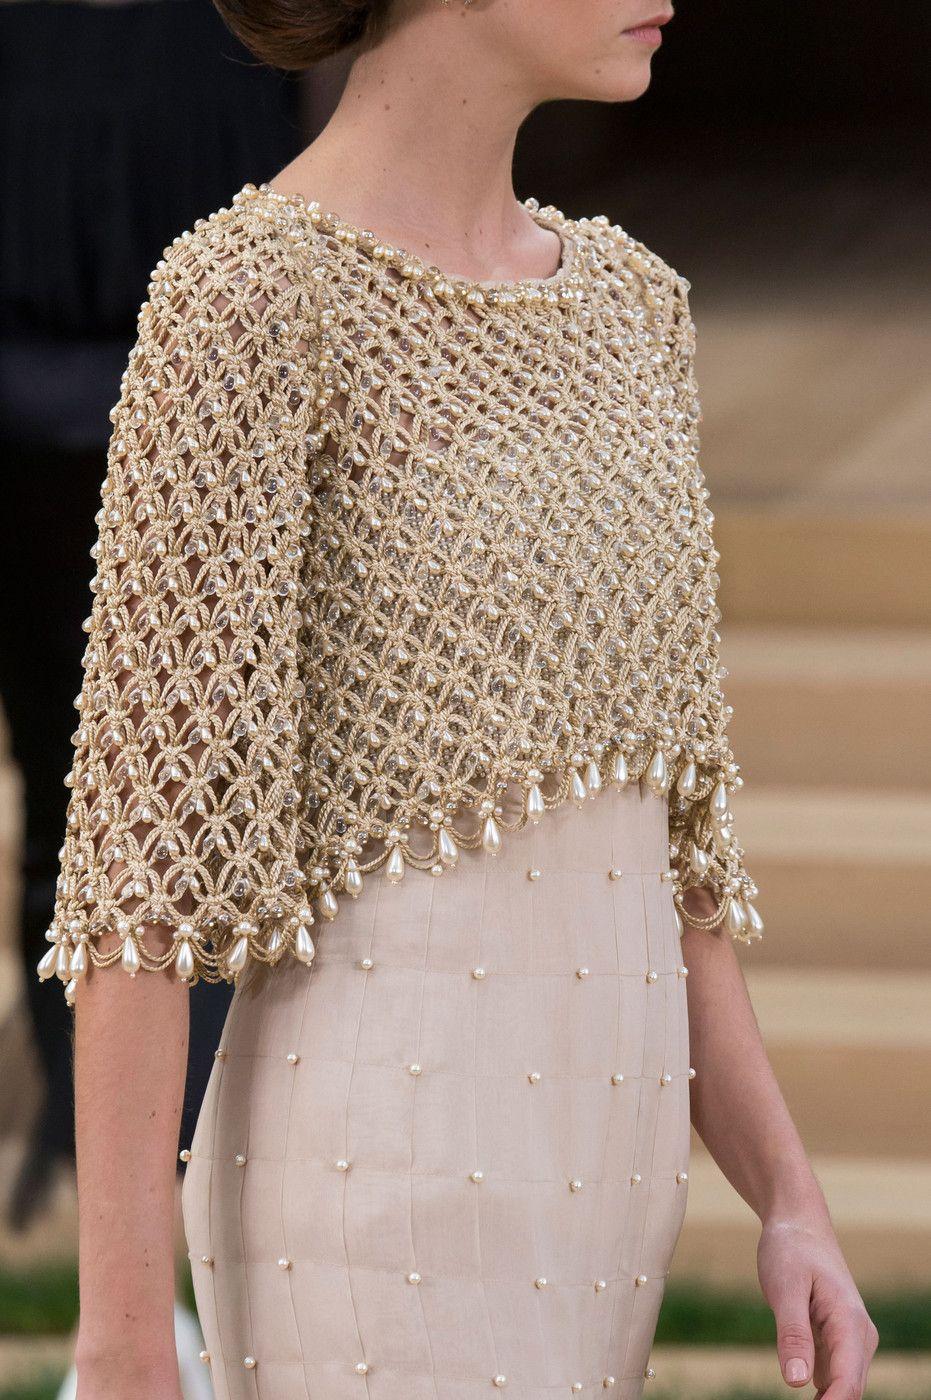 Crochet Inspiration NO PATTERN #fashion #crochet #DIY ...